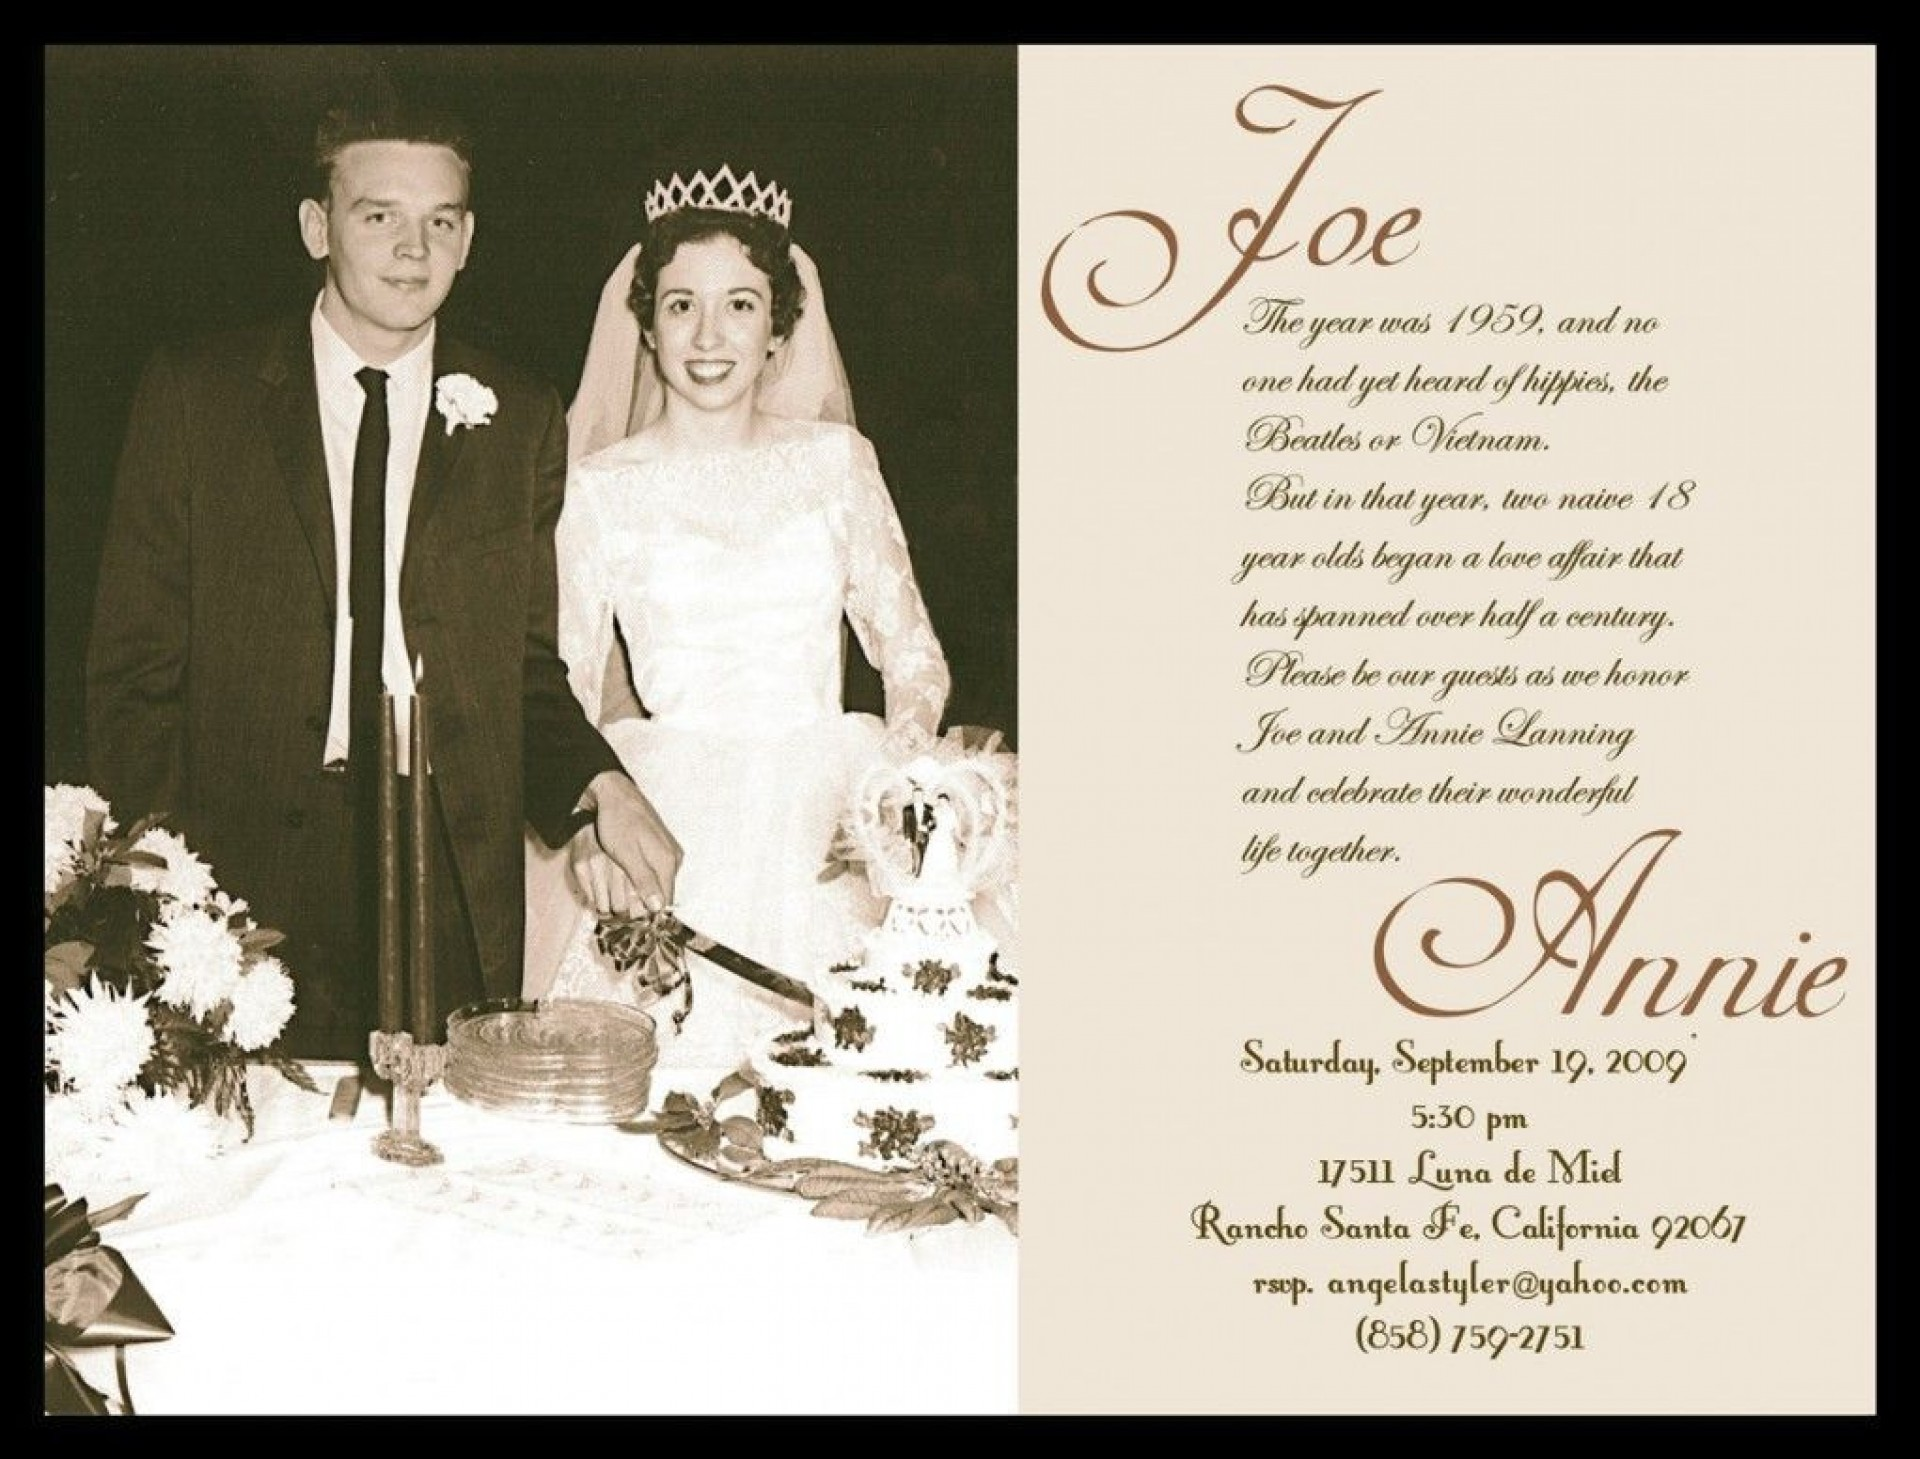 005 Sensational 50th Wedding Anniversary Invitation Template Concept  Templates Card Sample Golden1920